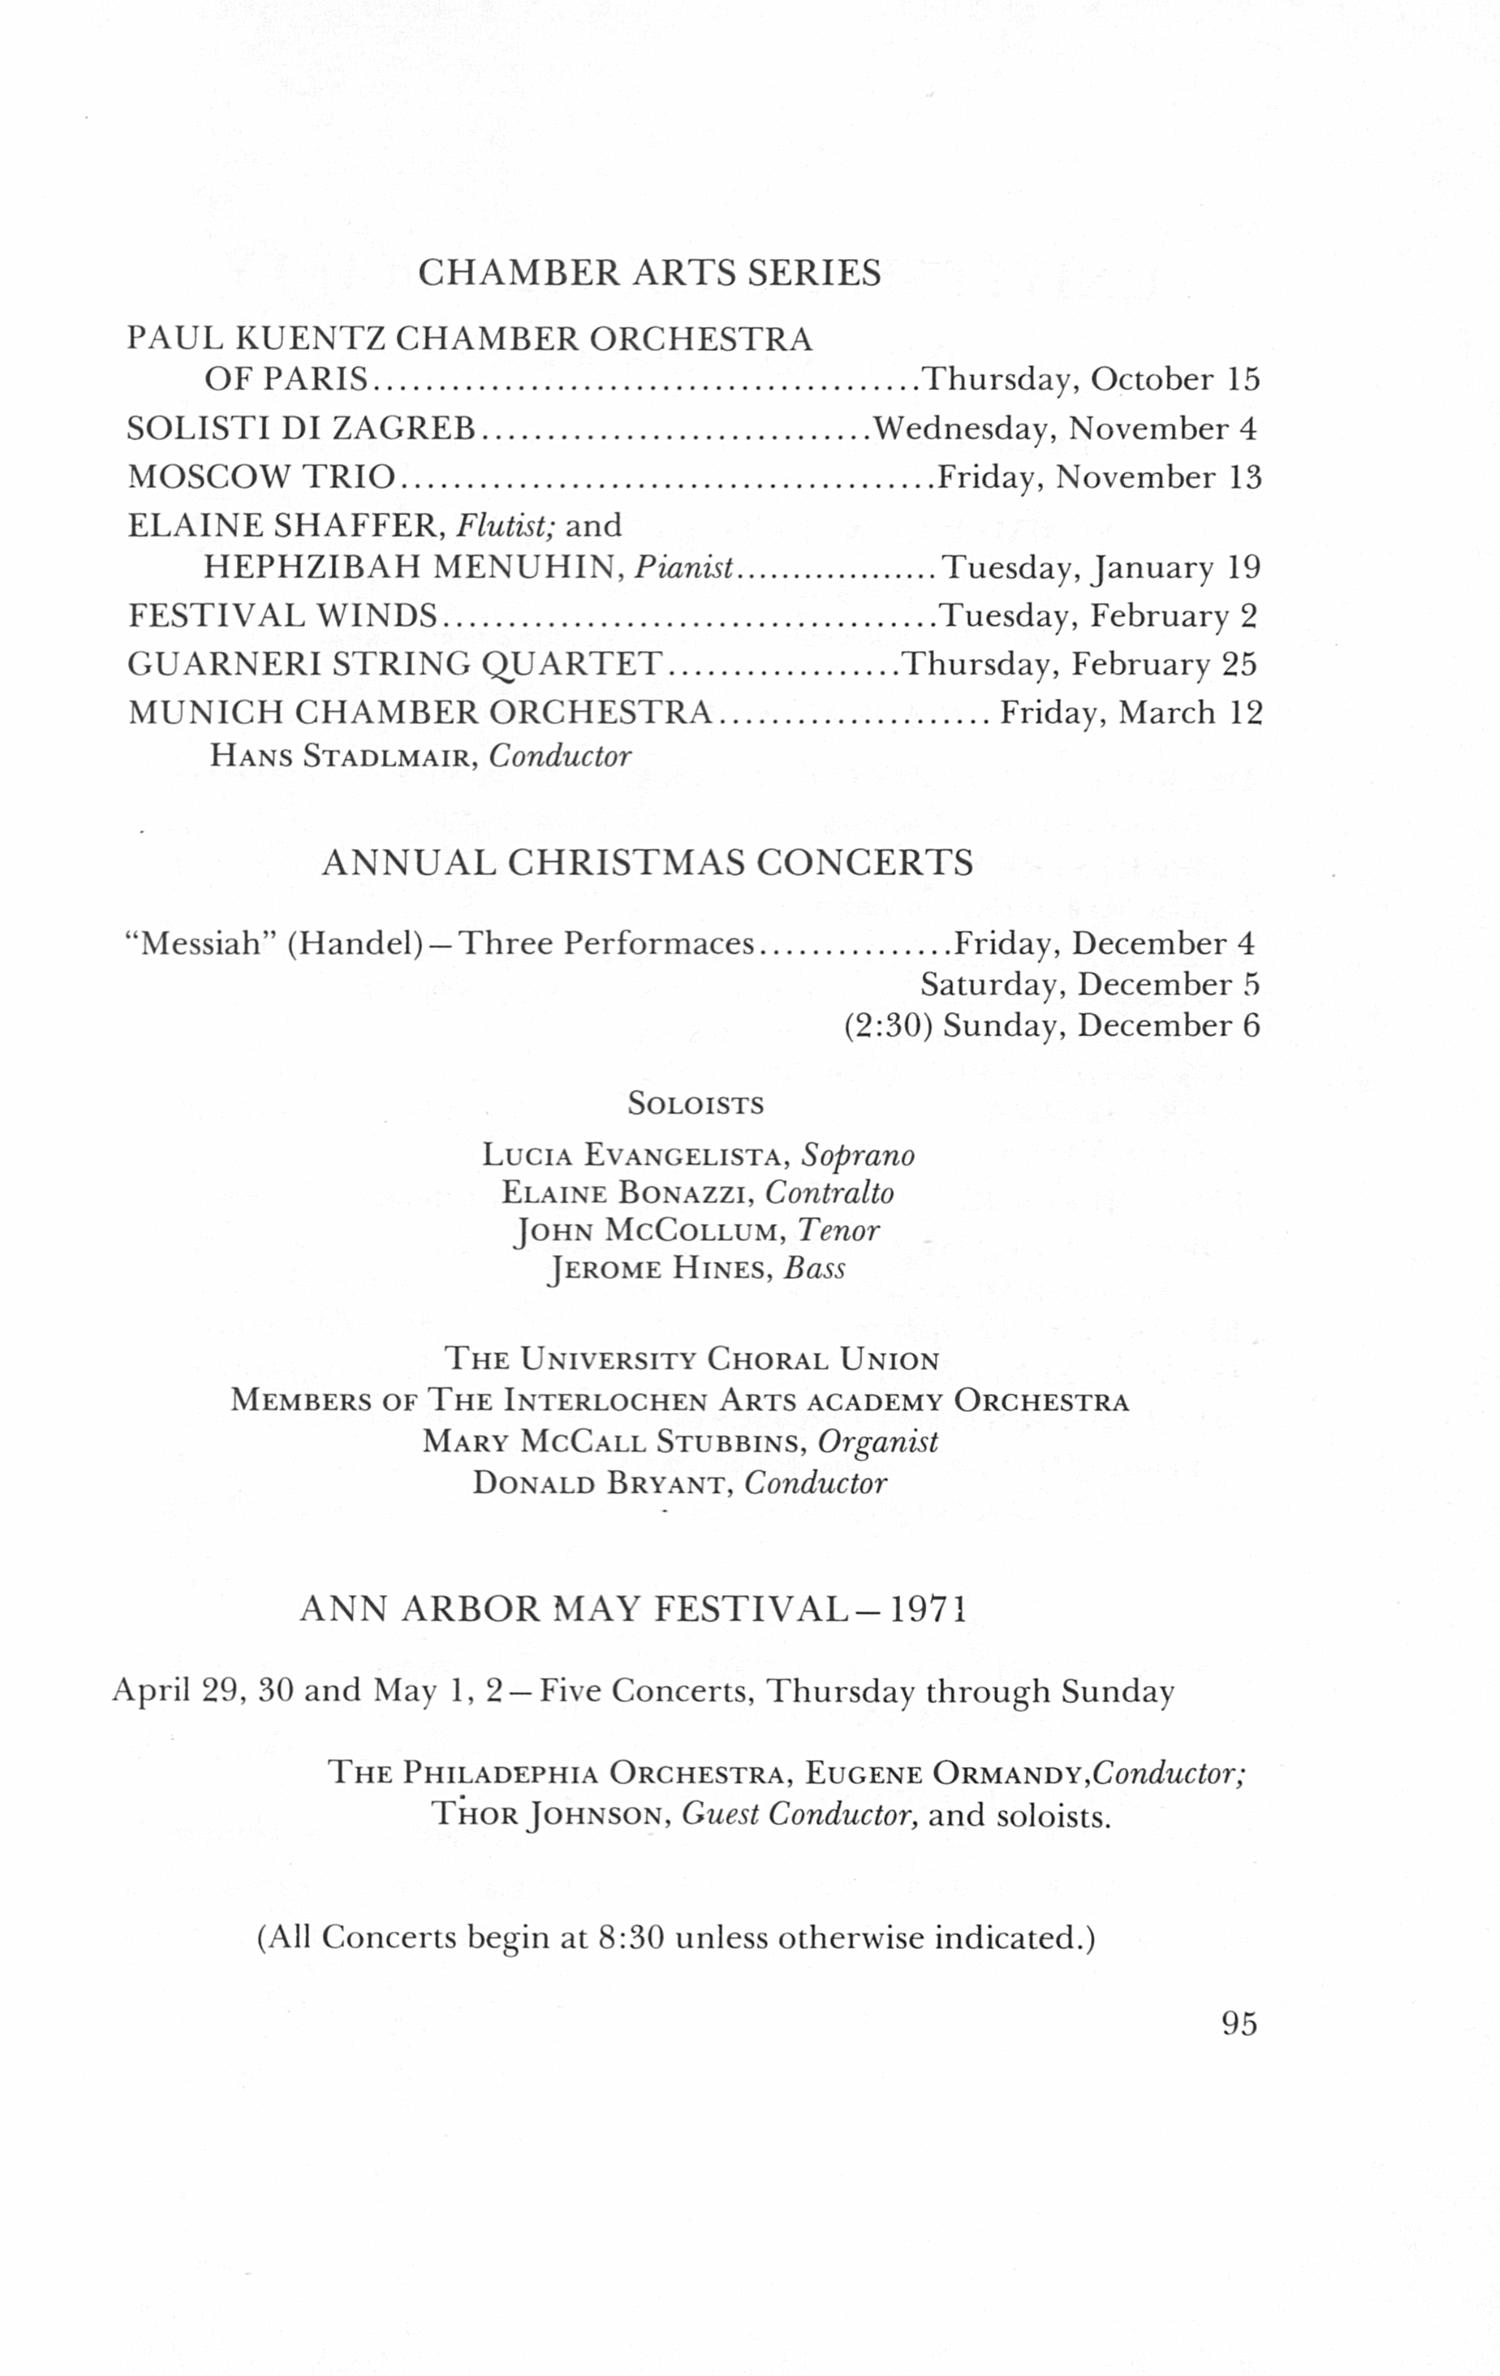 UMS Concert Program, April 23, 24, 25, 26, 1970: The Seventy-seventh ...